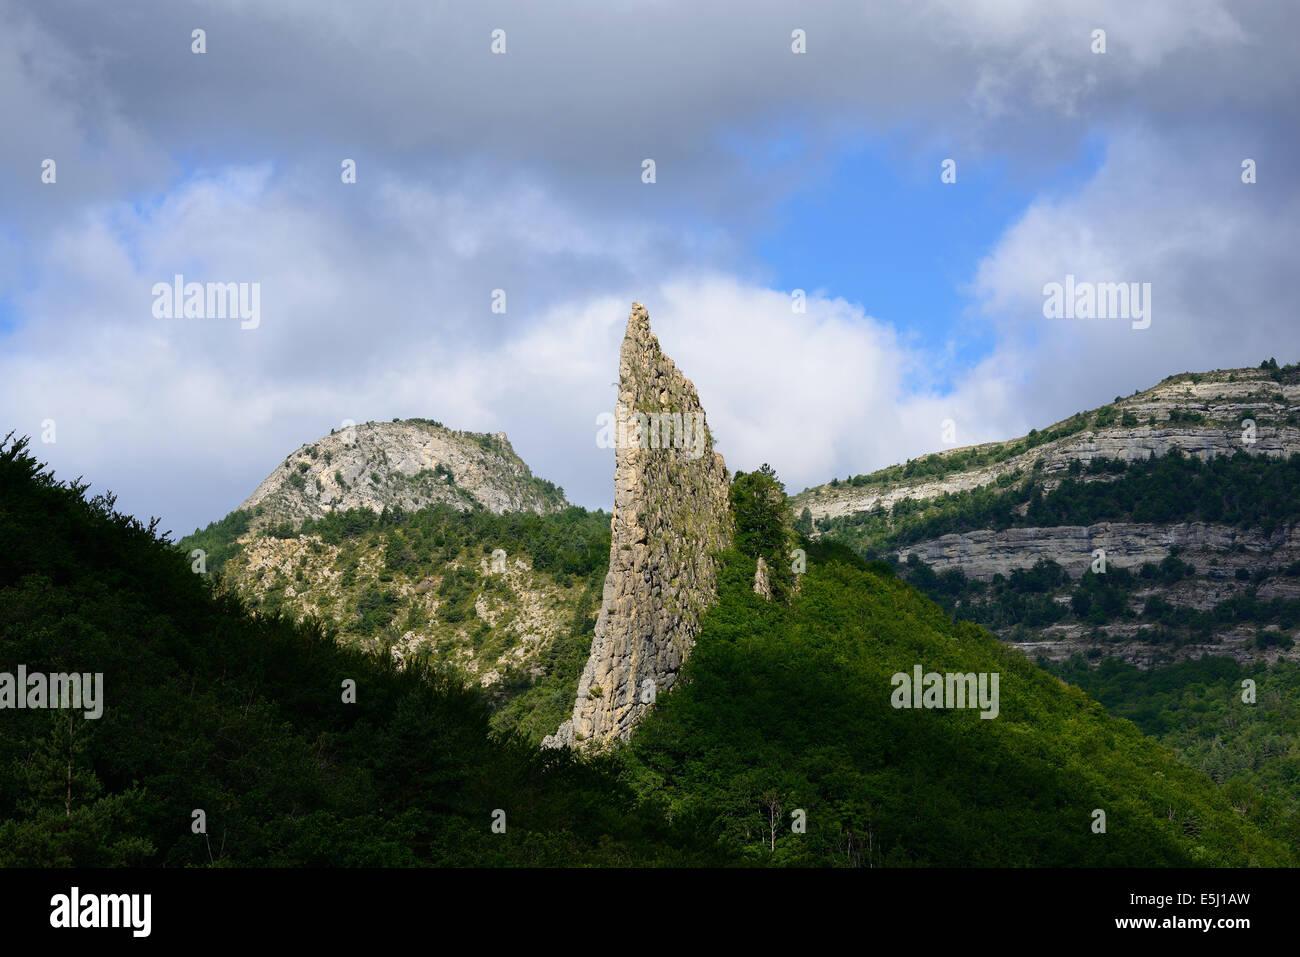 LIMESTONE 'BLADE'. Lame de Facibelle, Alpes-de-Haute-Provence, France. - Stock Image